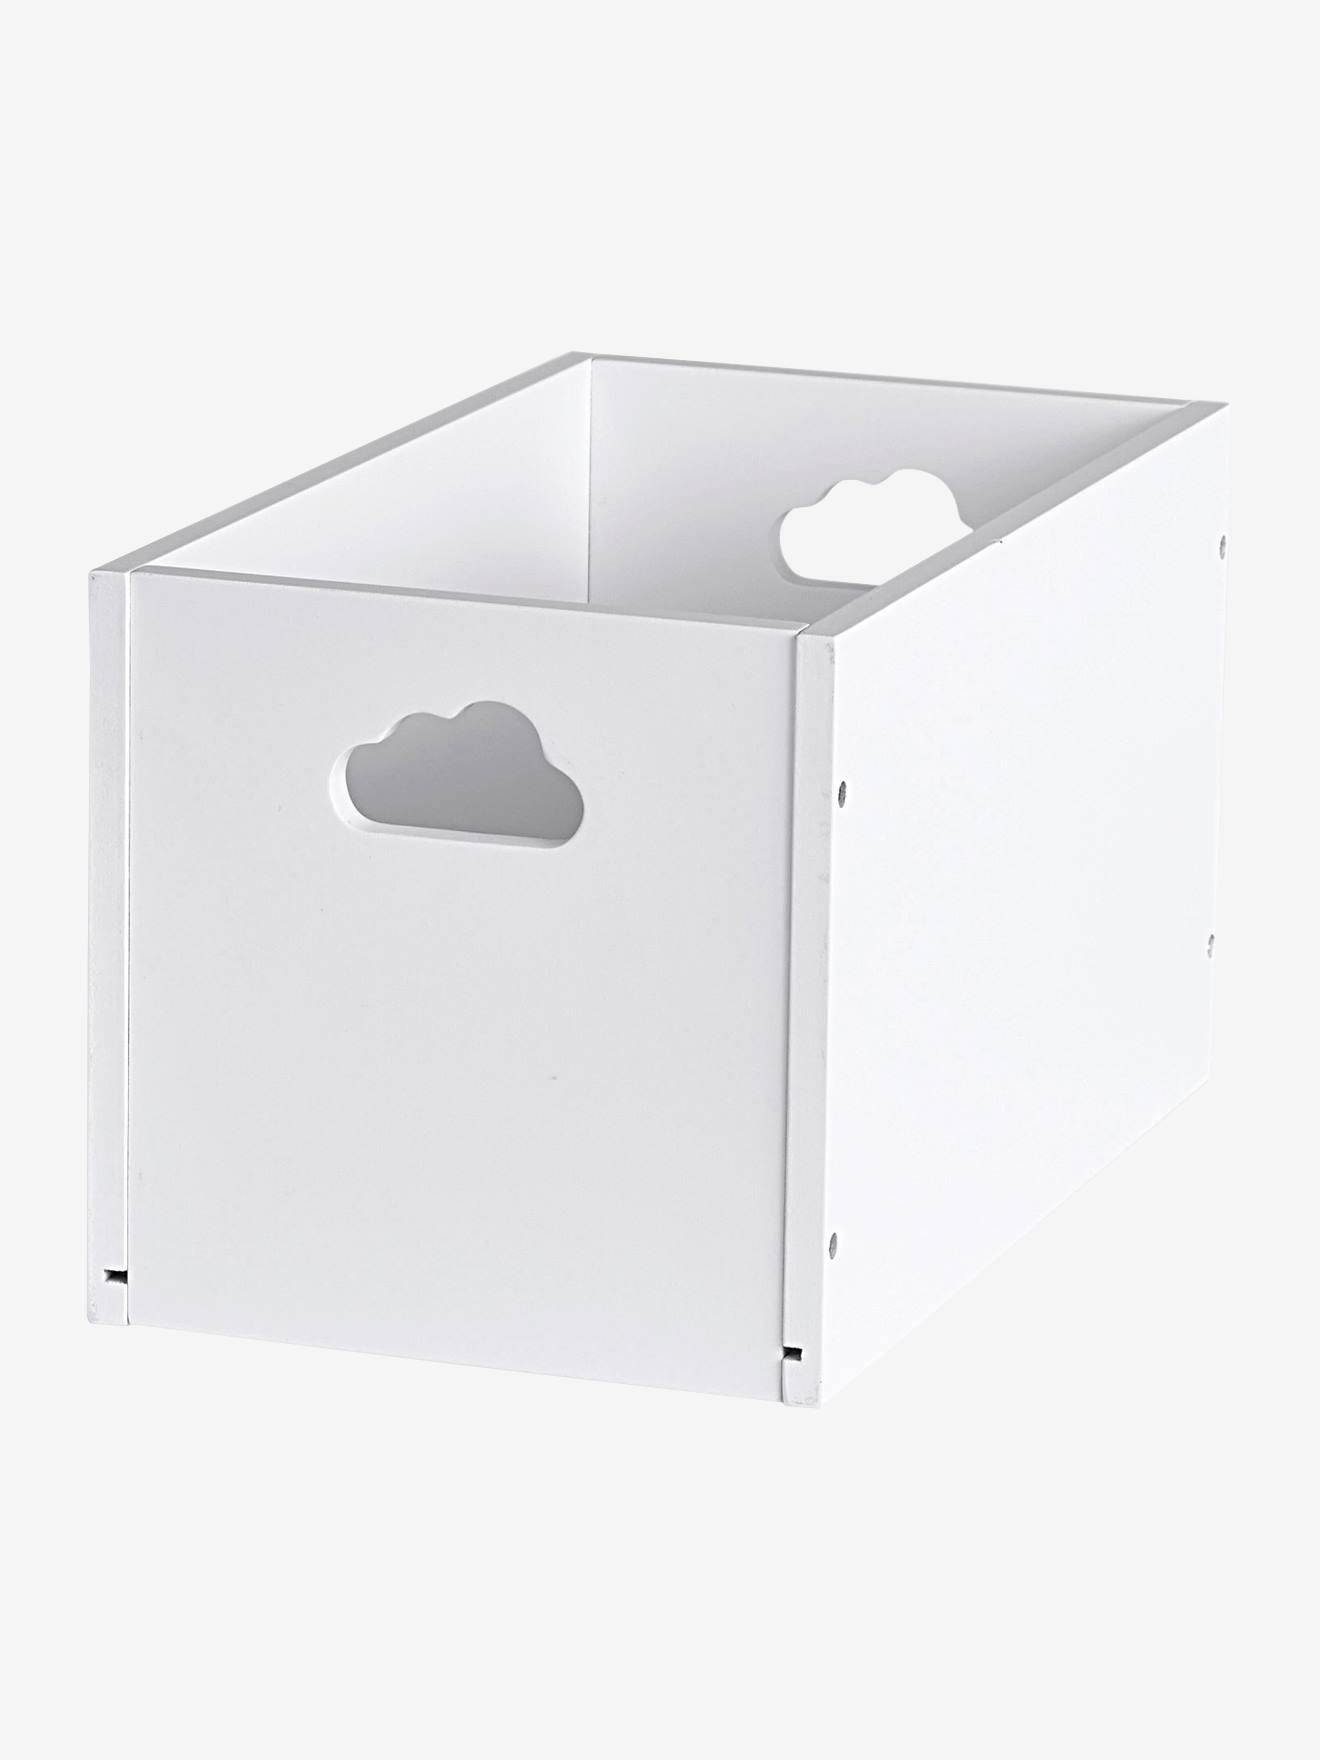 Storage u0026 Decoration-Storages-Storage Boxes u0026 Baskets-Small Storage Box & Childrenu0027s Storage Baskets   Vertbaudet Aboutintivar.Com